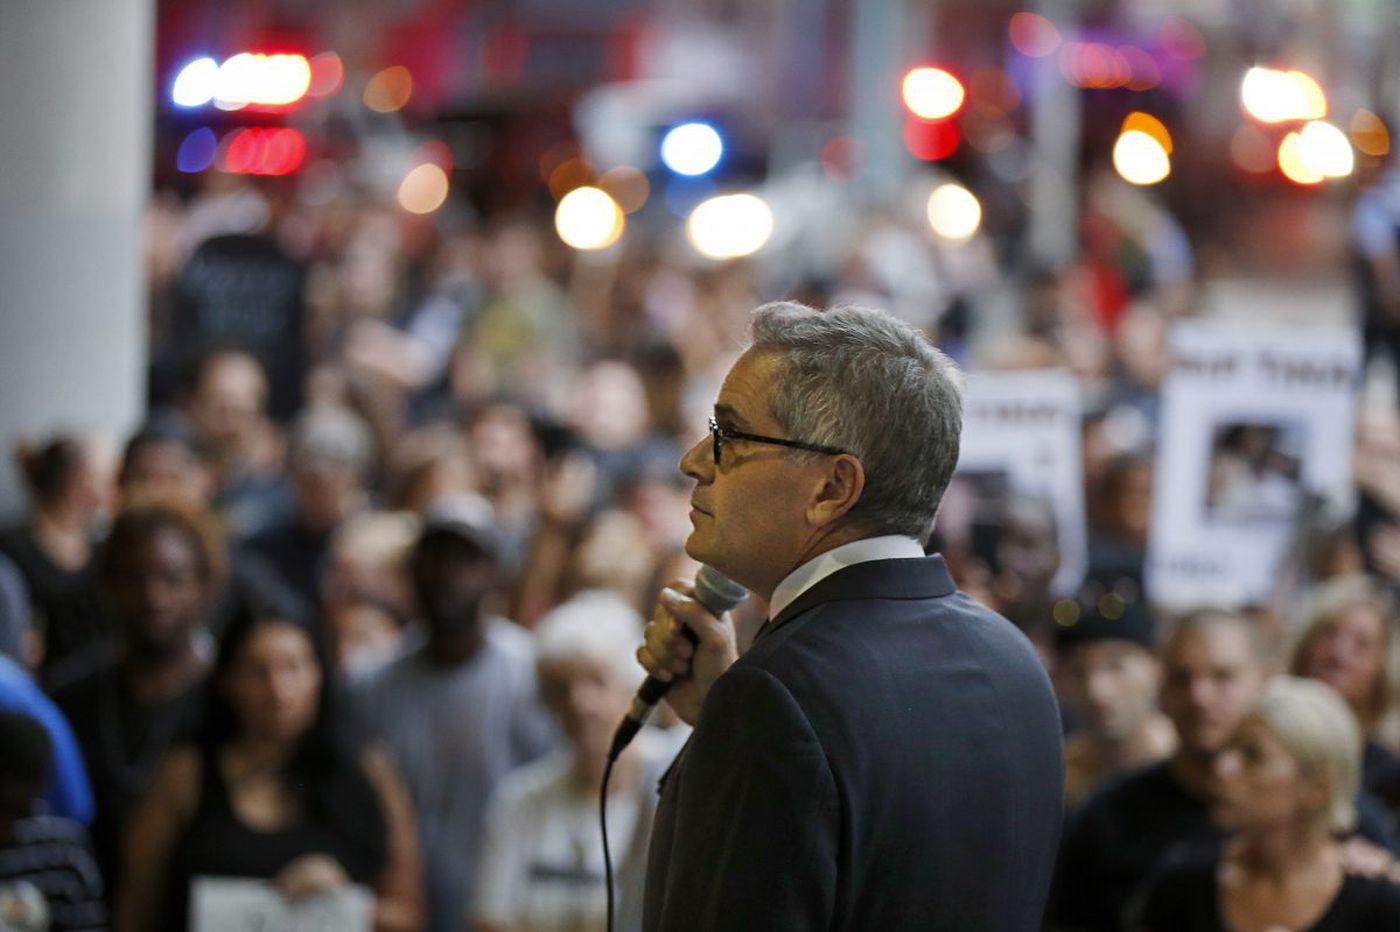 DA candidate endorses safe injection sites for heroin